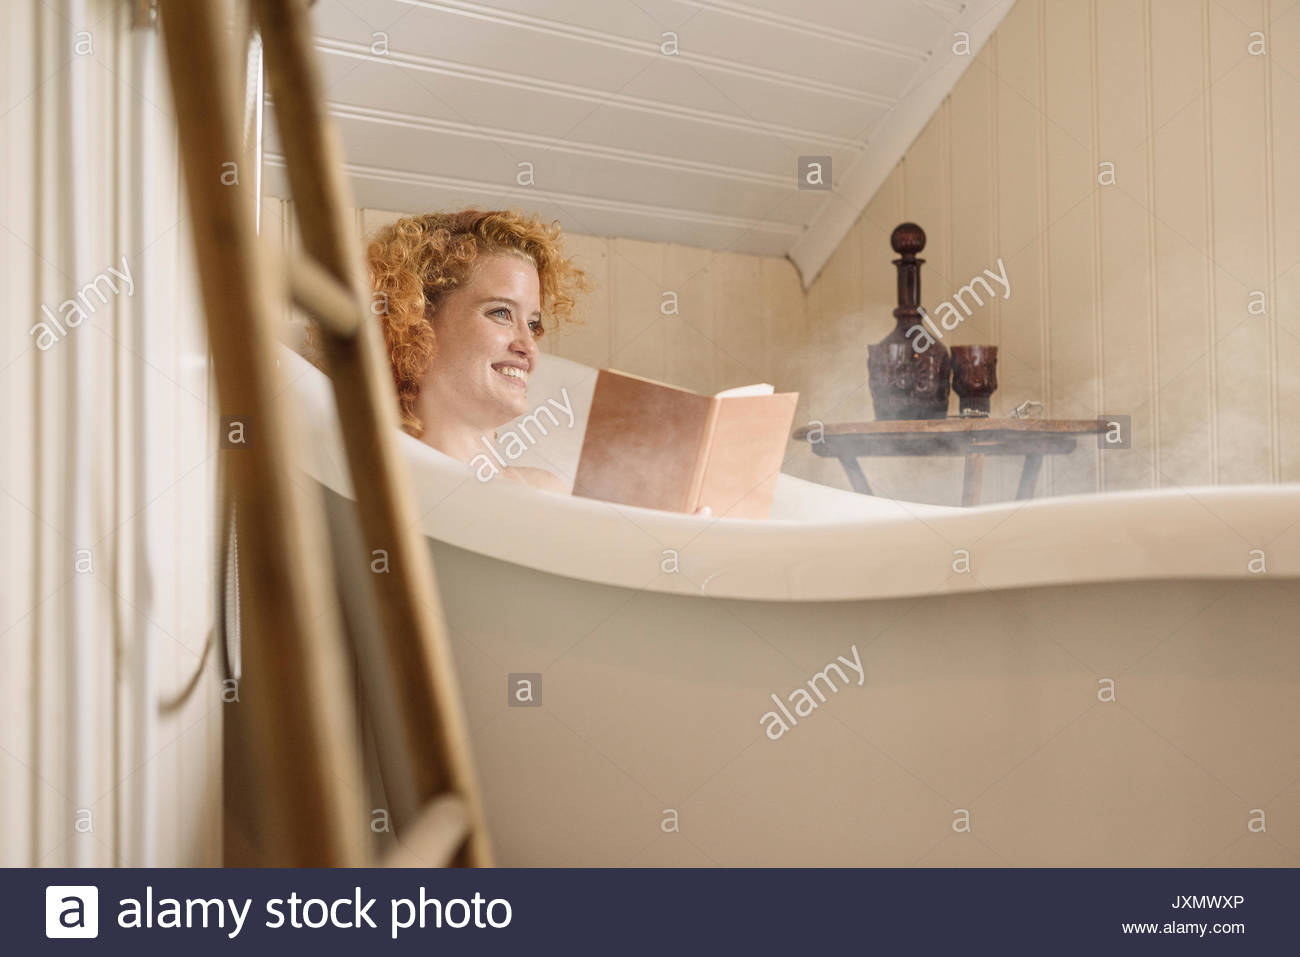 Woman in bathtub reading book Stock Photo: 154123390 - Alamy